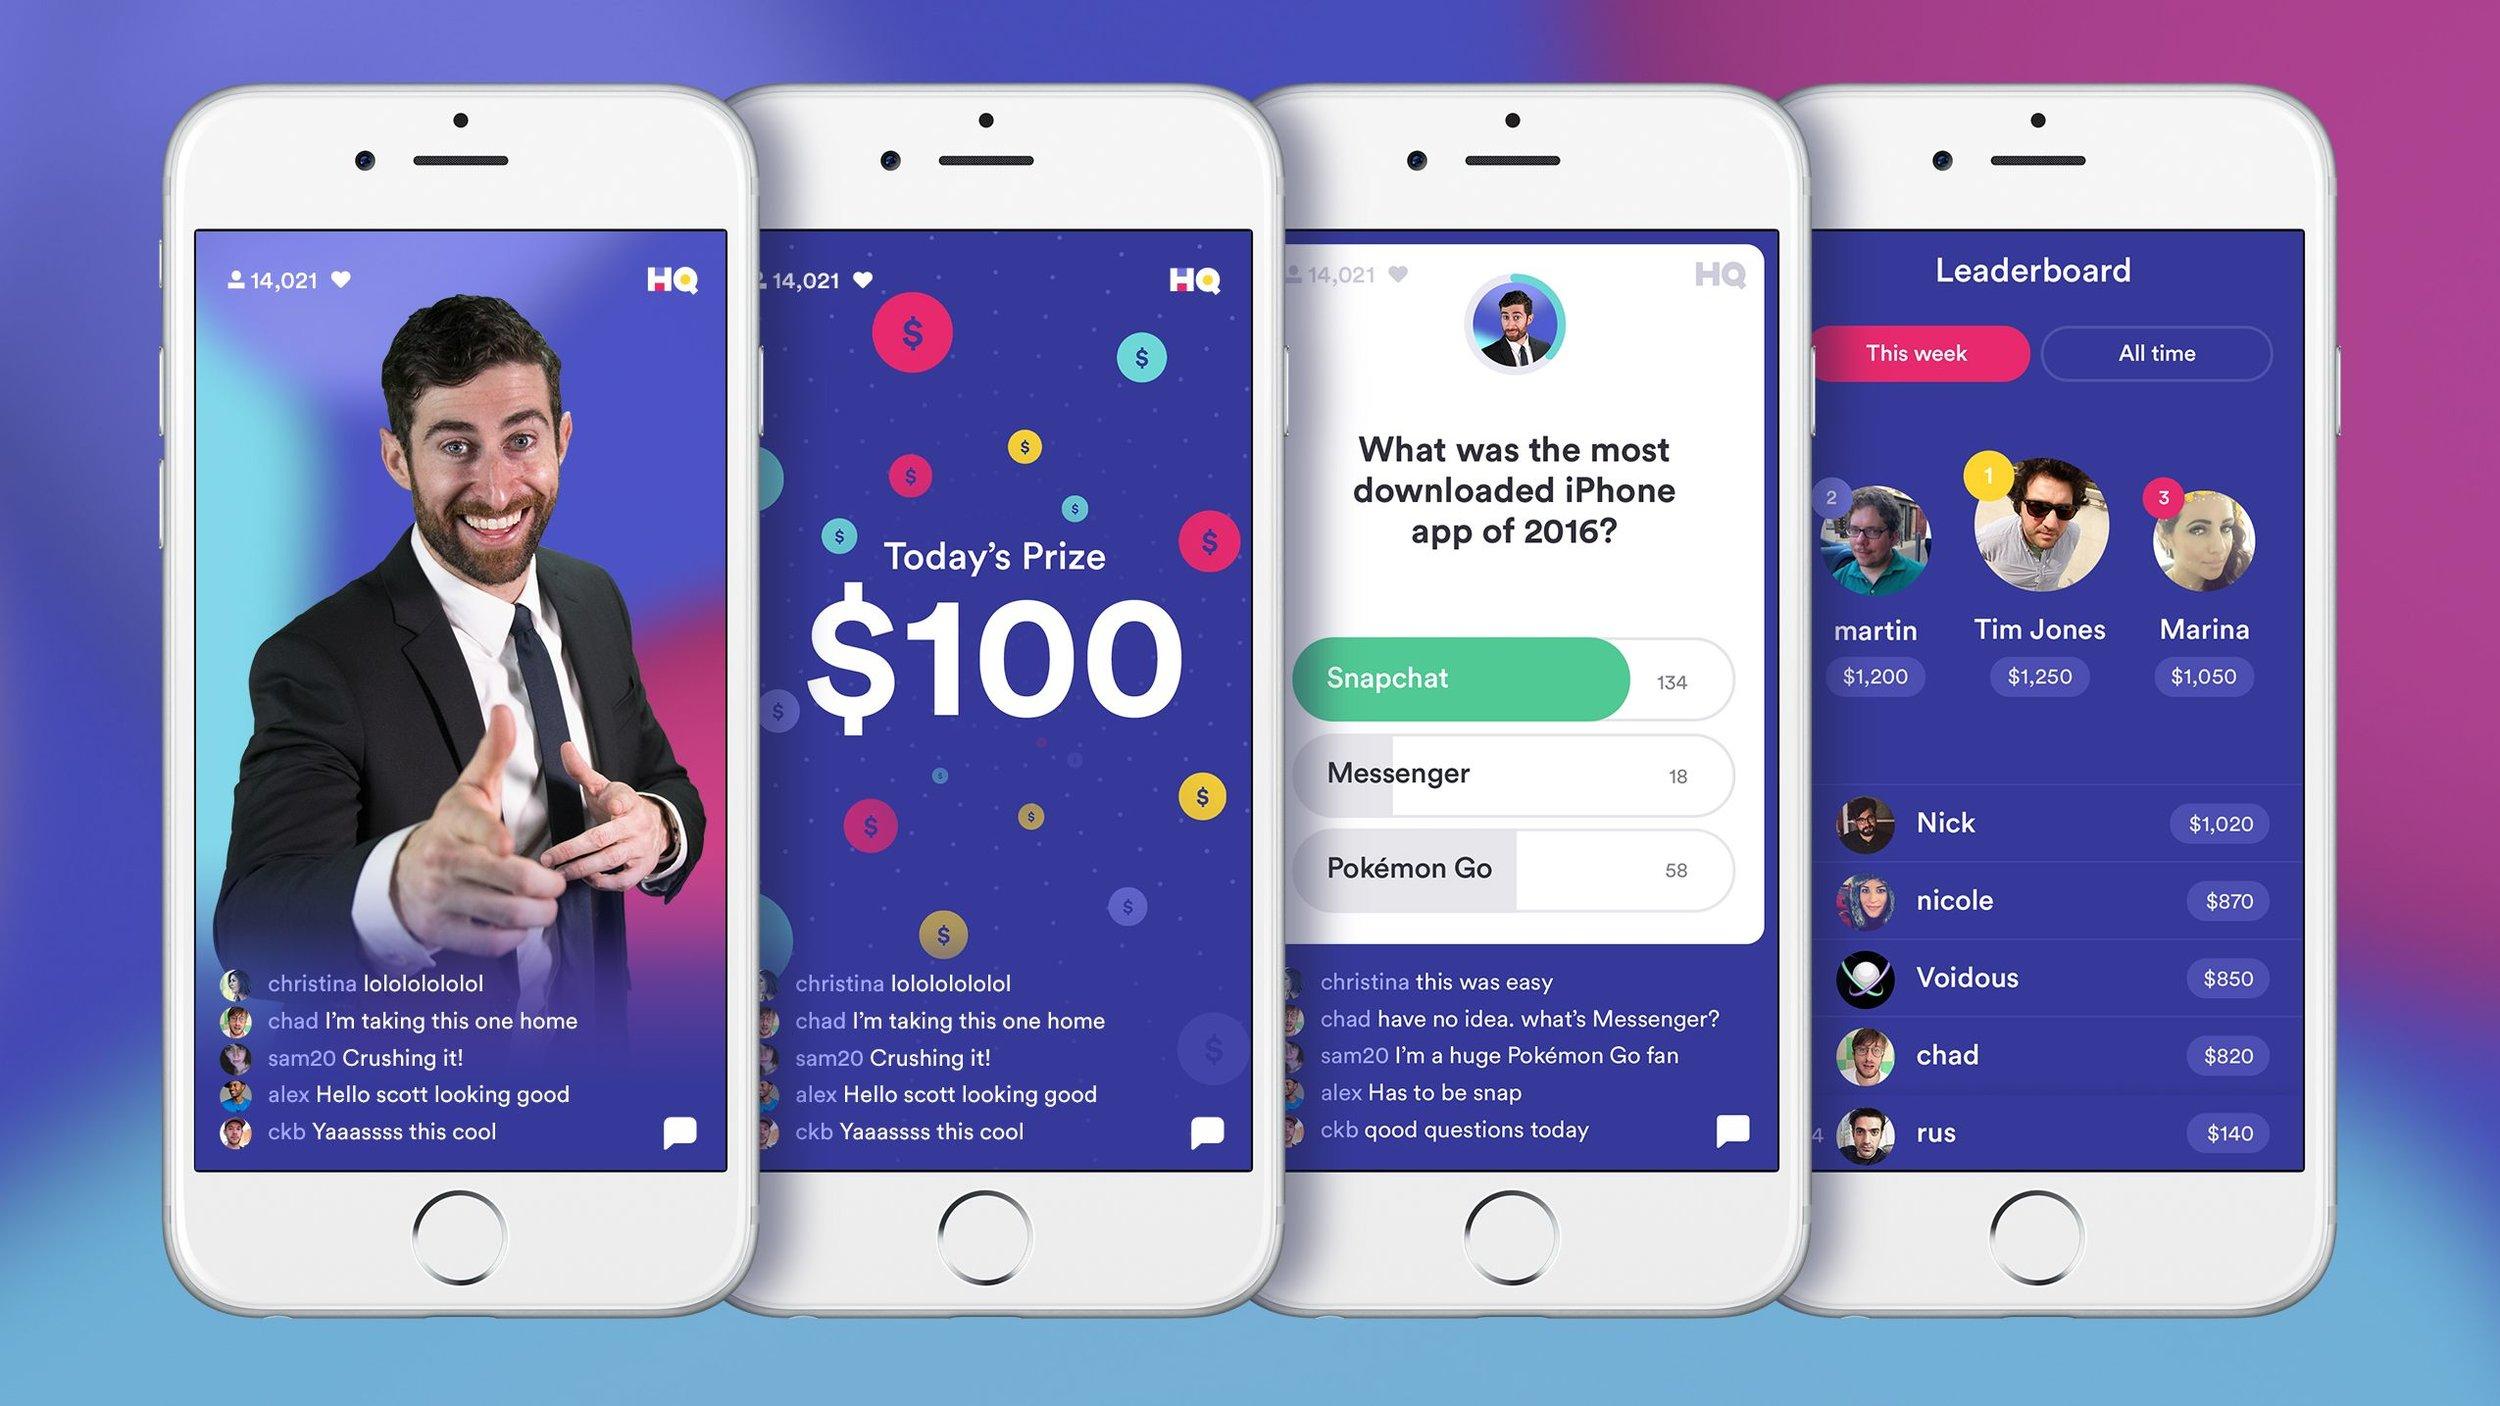 hq-trivia-android-quiz-app-ios.jpg